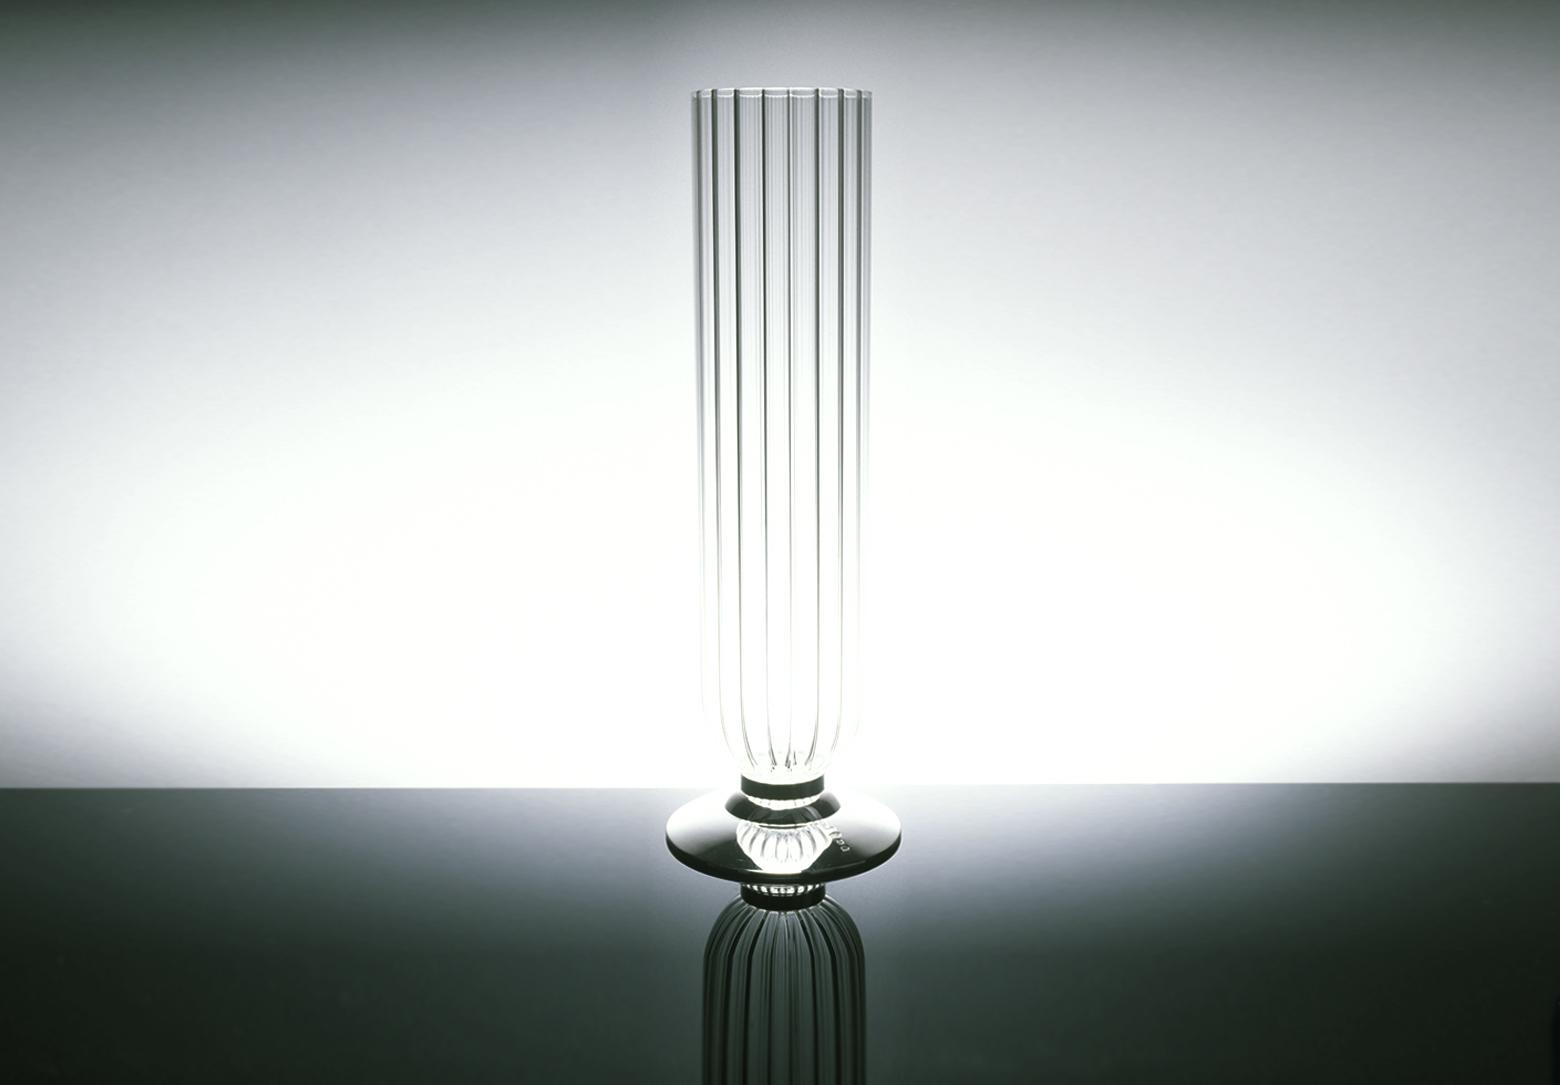 contemporary silverware - apollo vase silver and crystal contemporary silverware by martyn